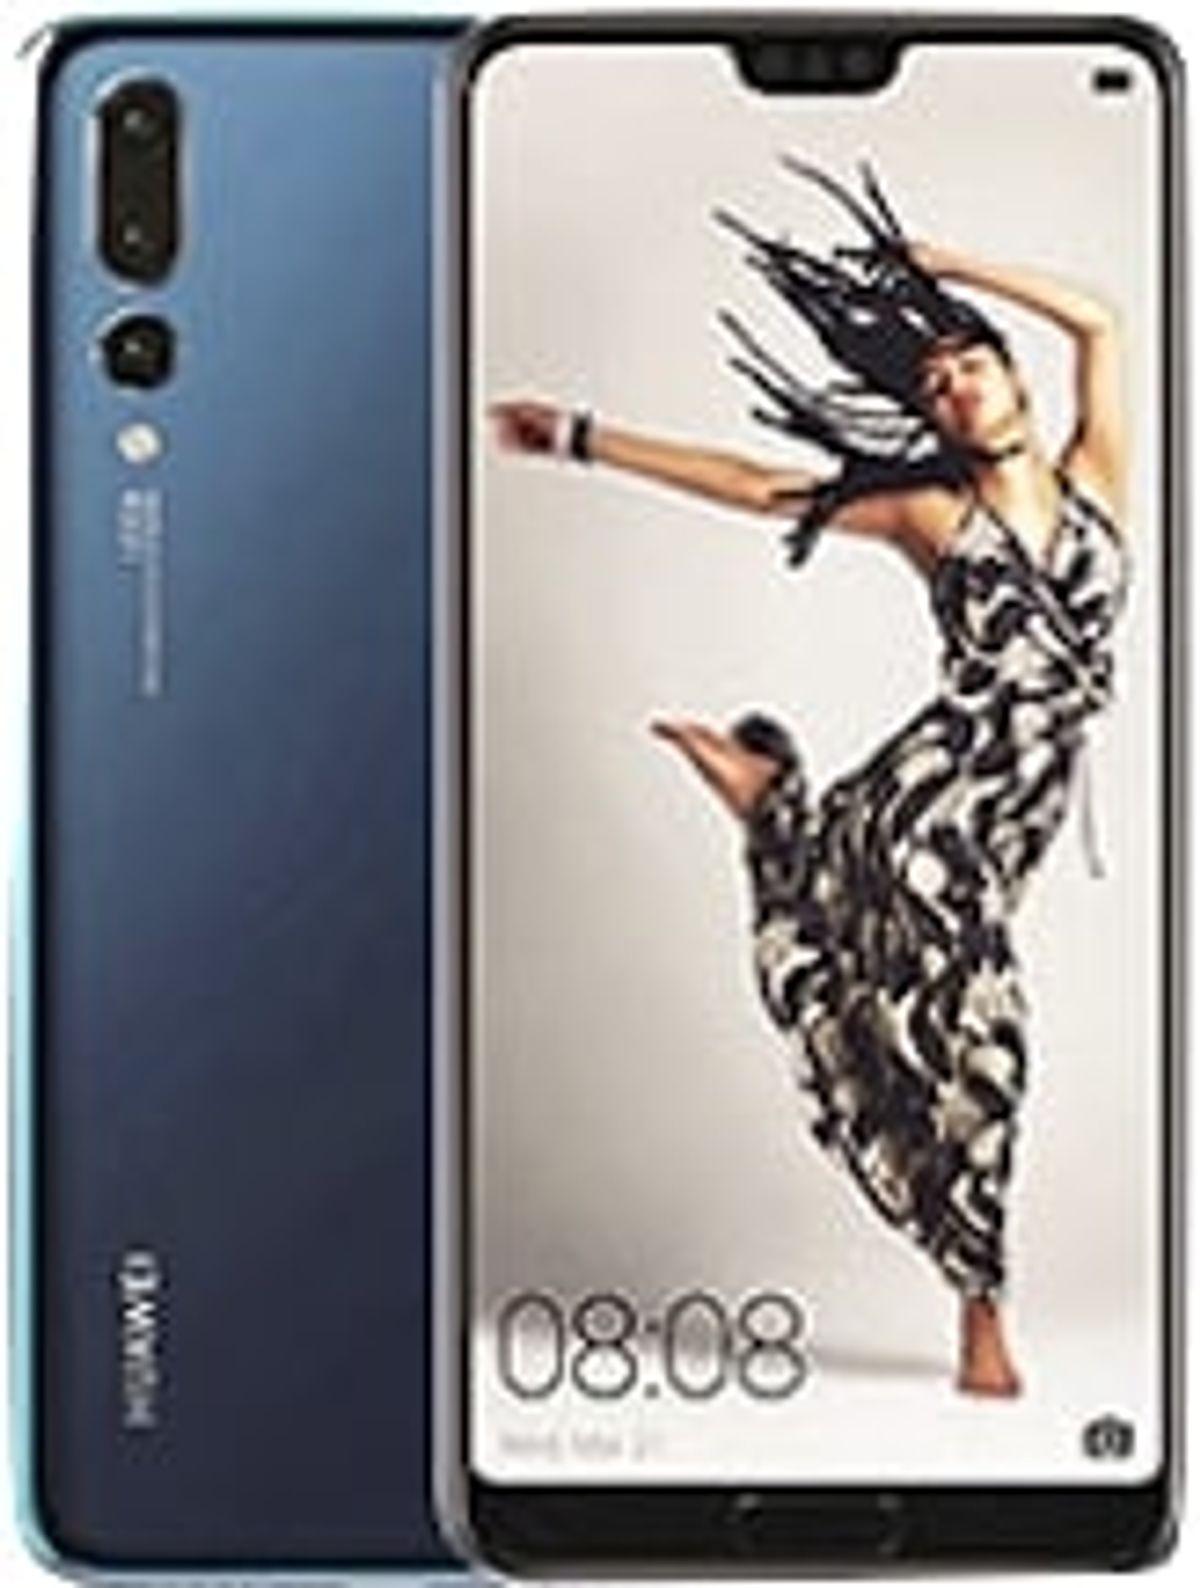 Best Huawei Phones Under 60000 - September 2019 in India